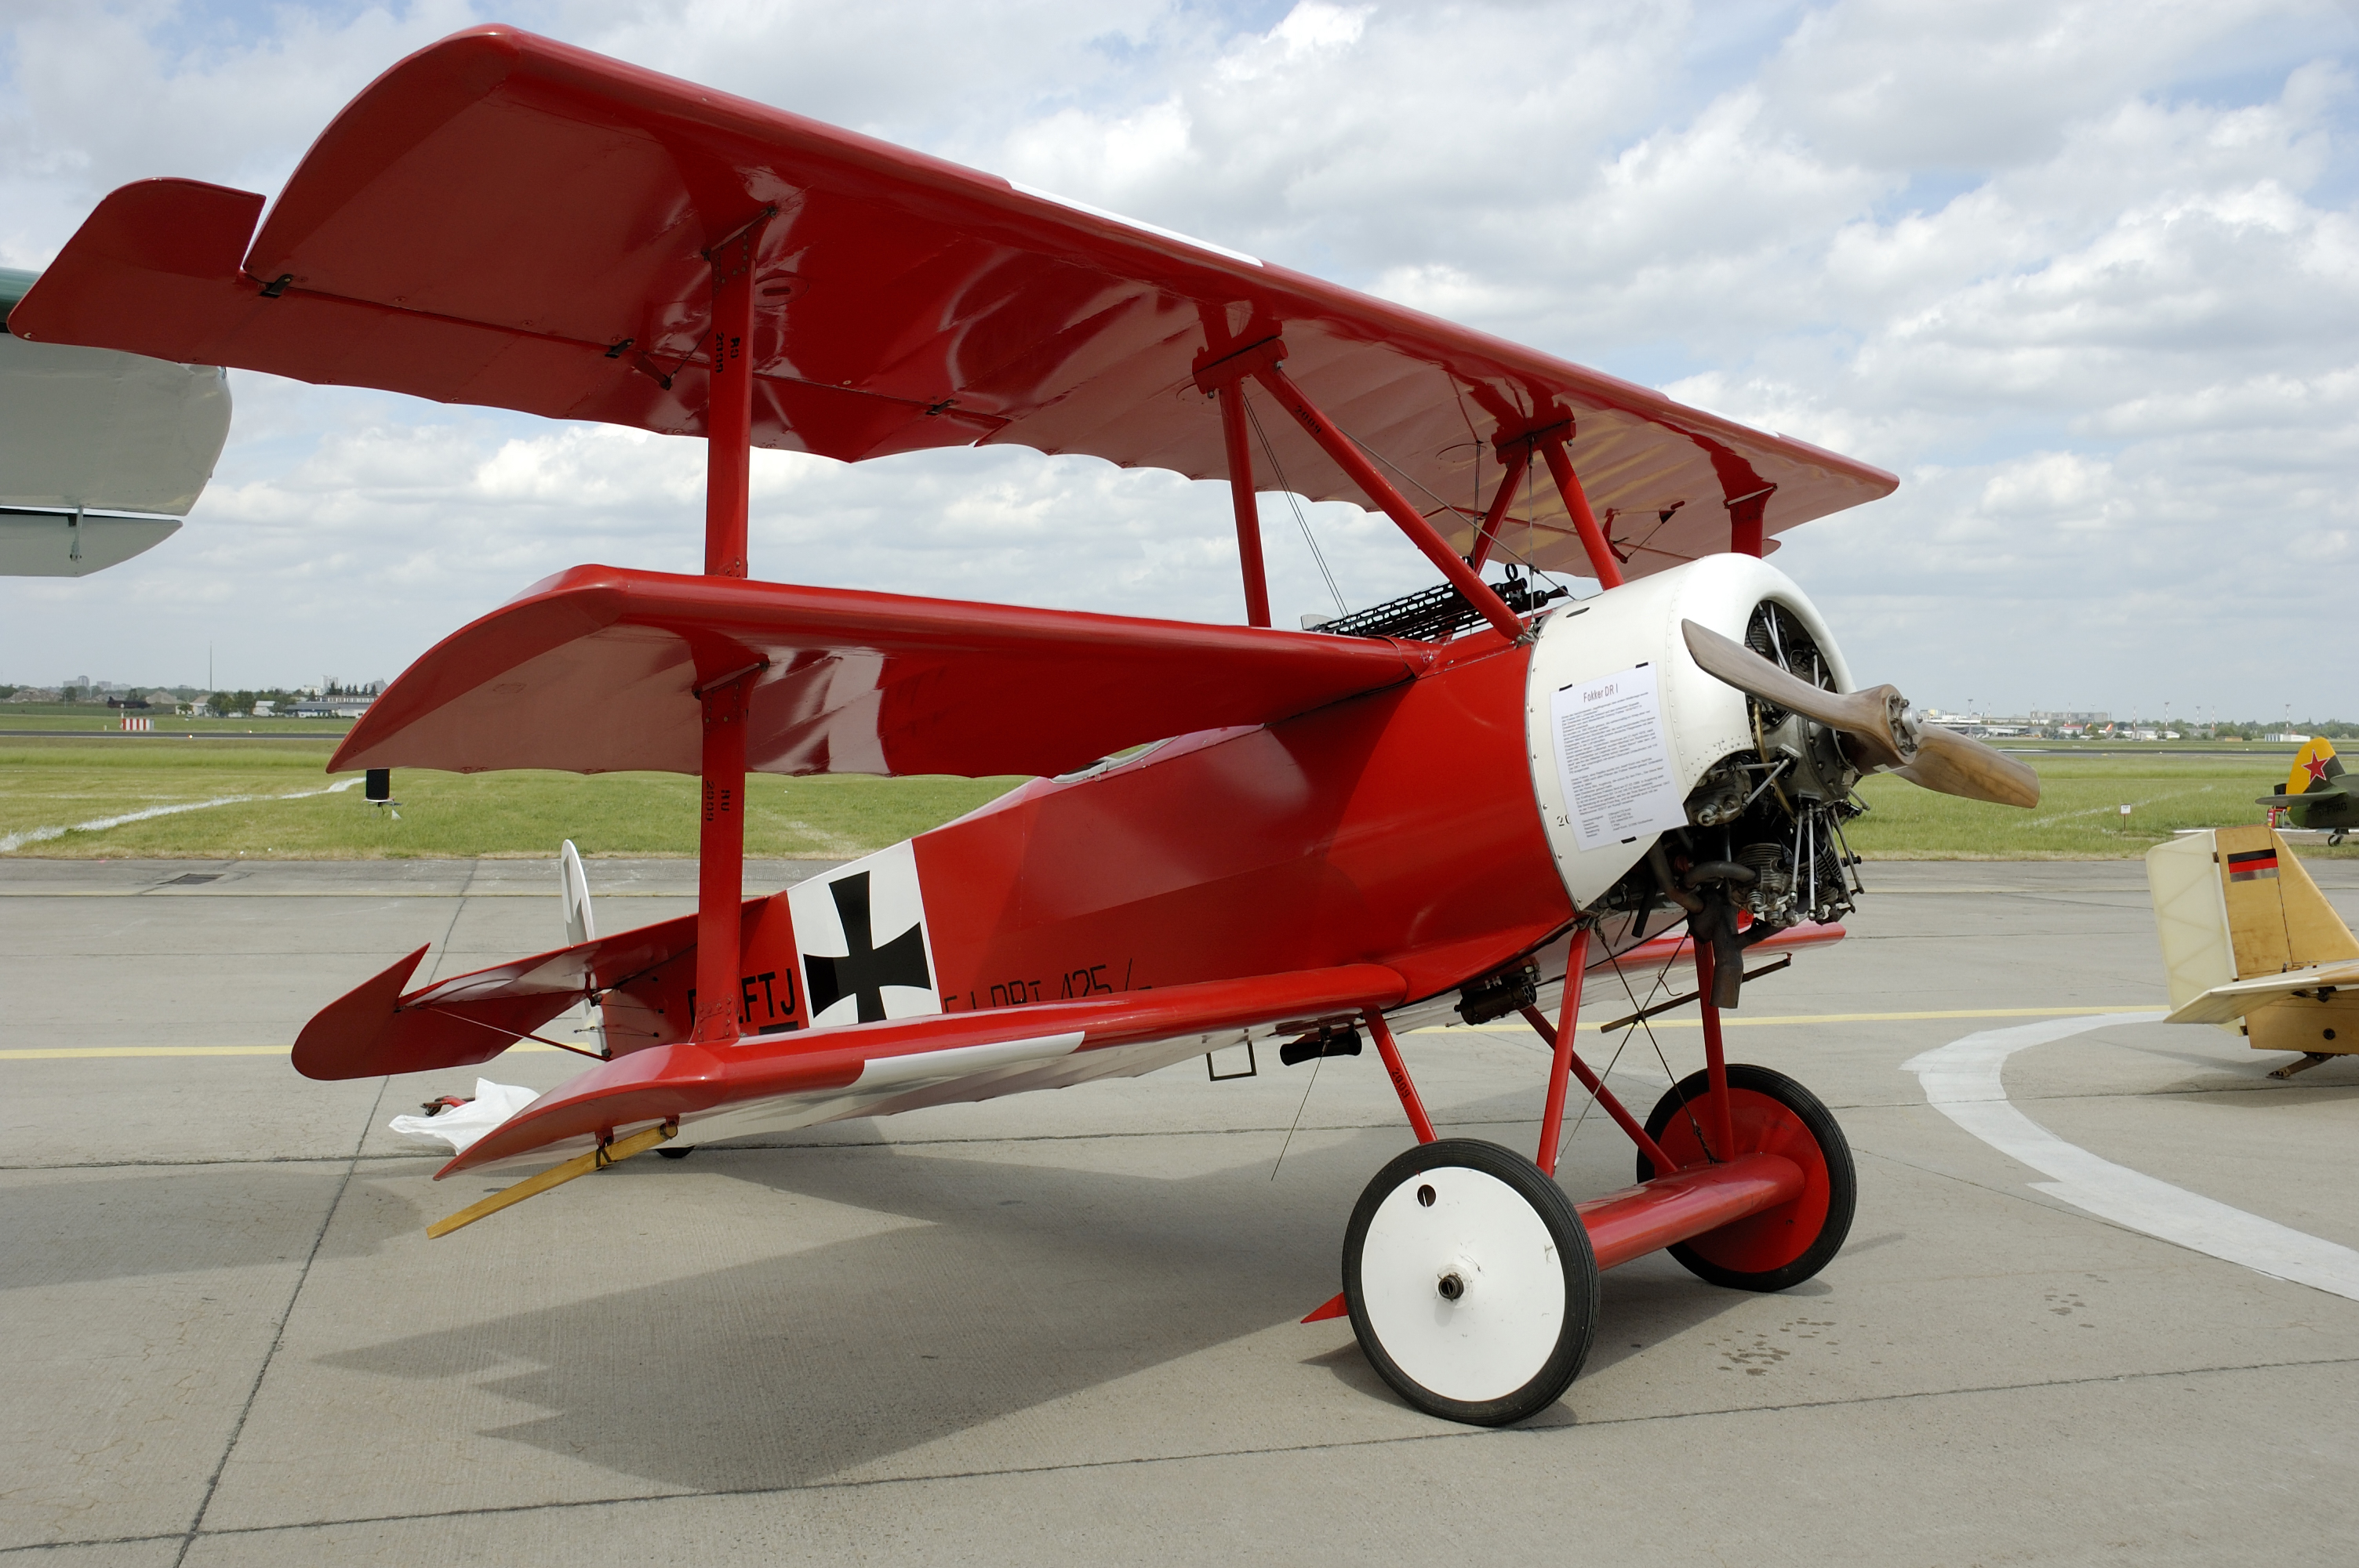 Манфред фон Рихтгофен летал на таком самолёте истребителе